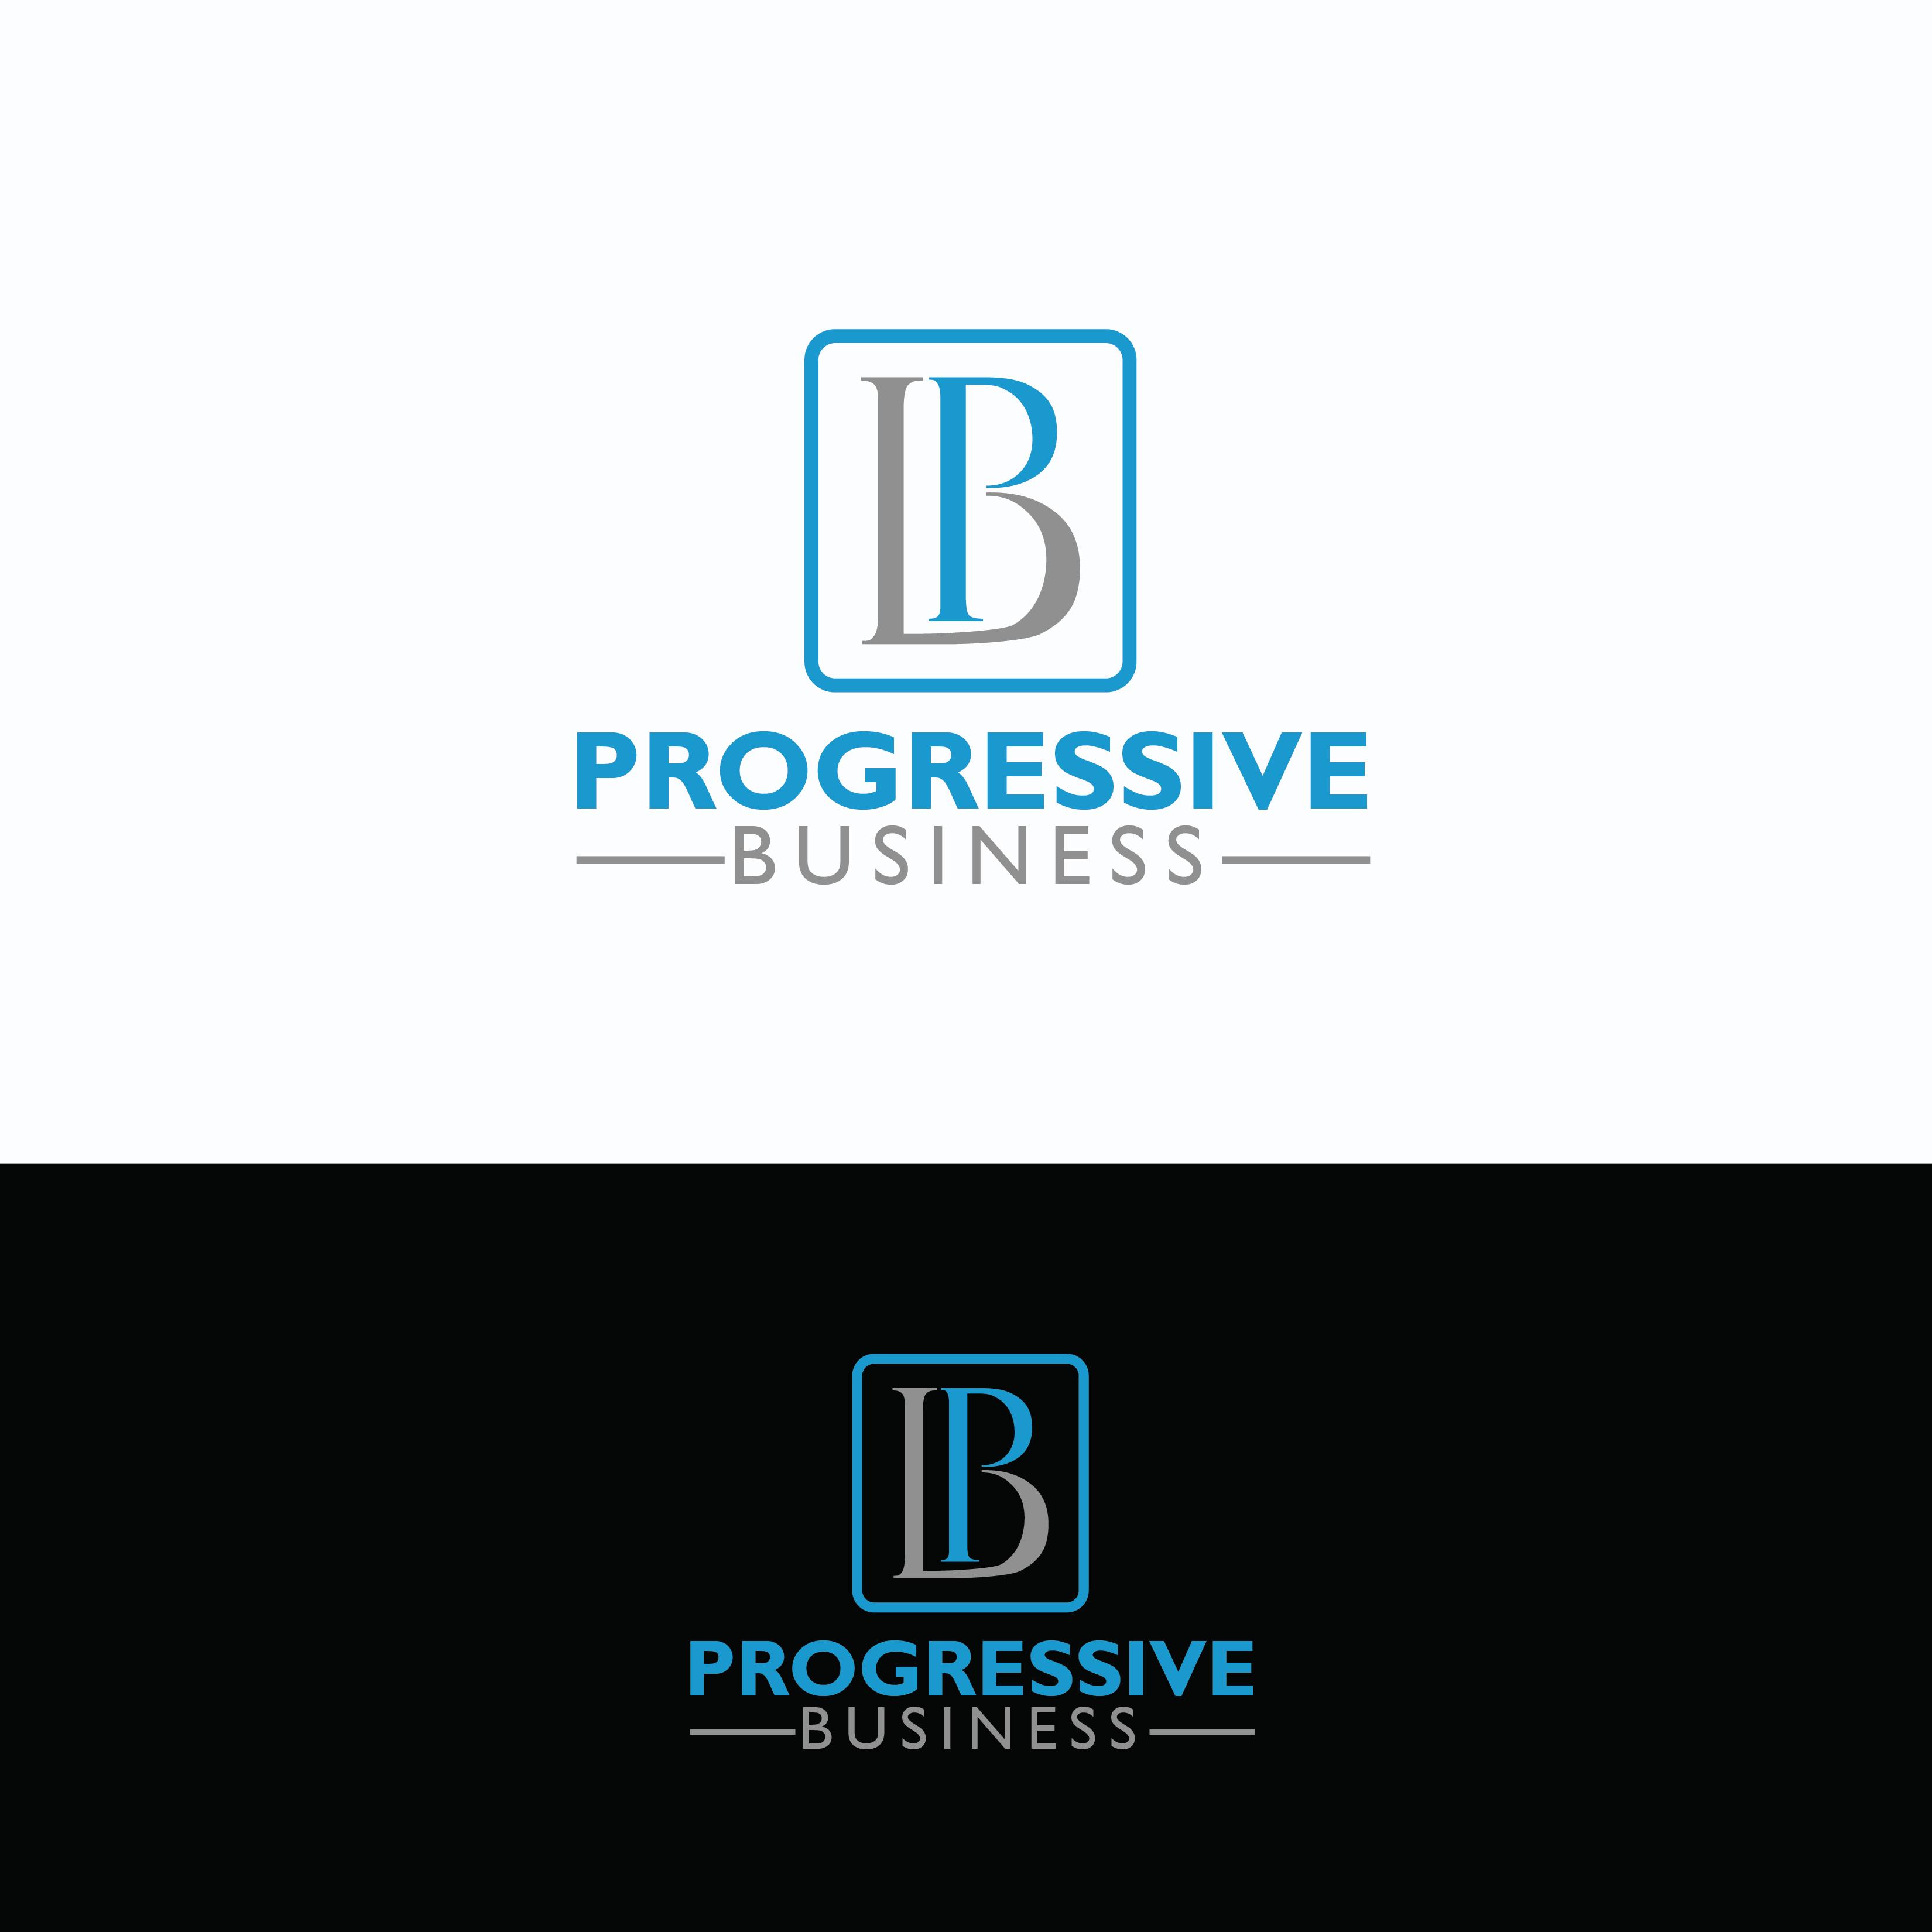 Logo Design by Private User - Entry No. 123 in the Logo Design Contest Captivating Logo Design for Progressive Business.